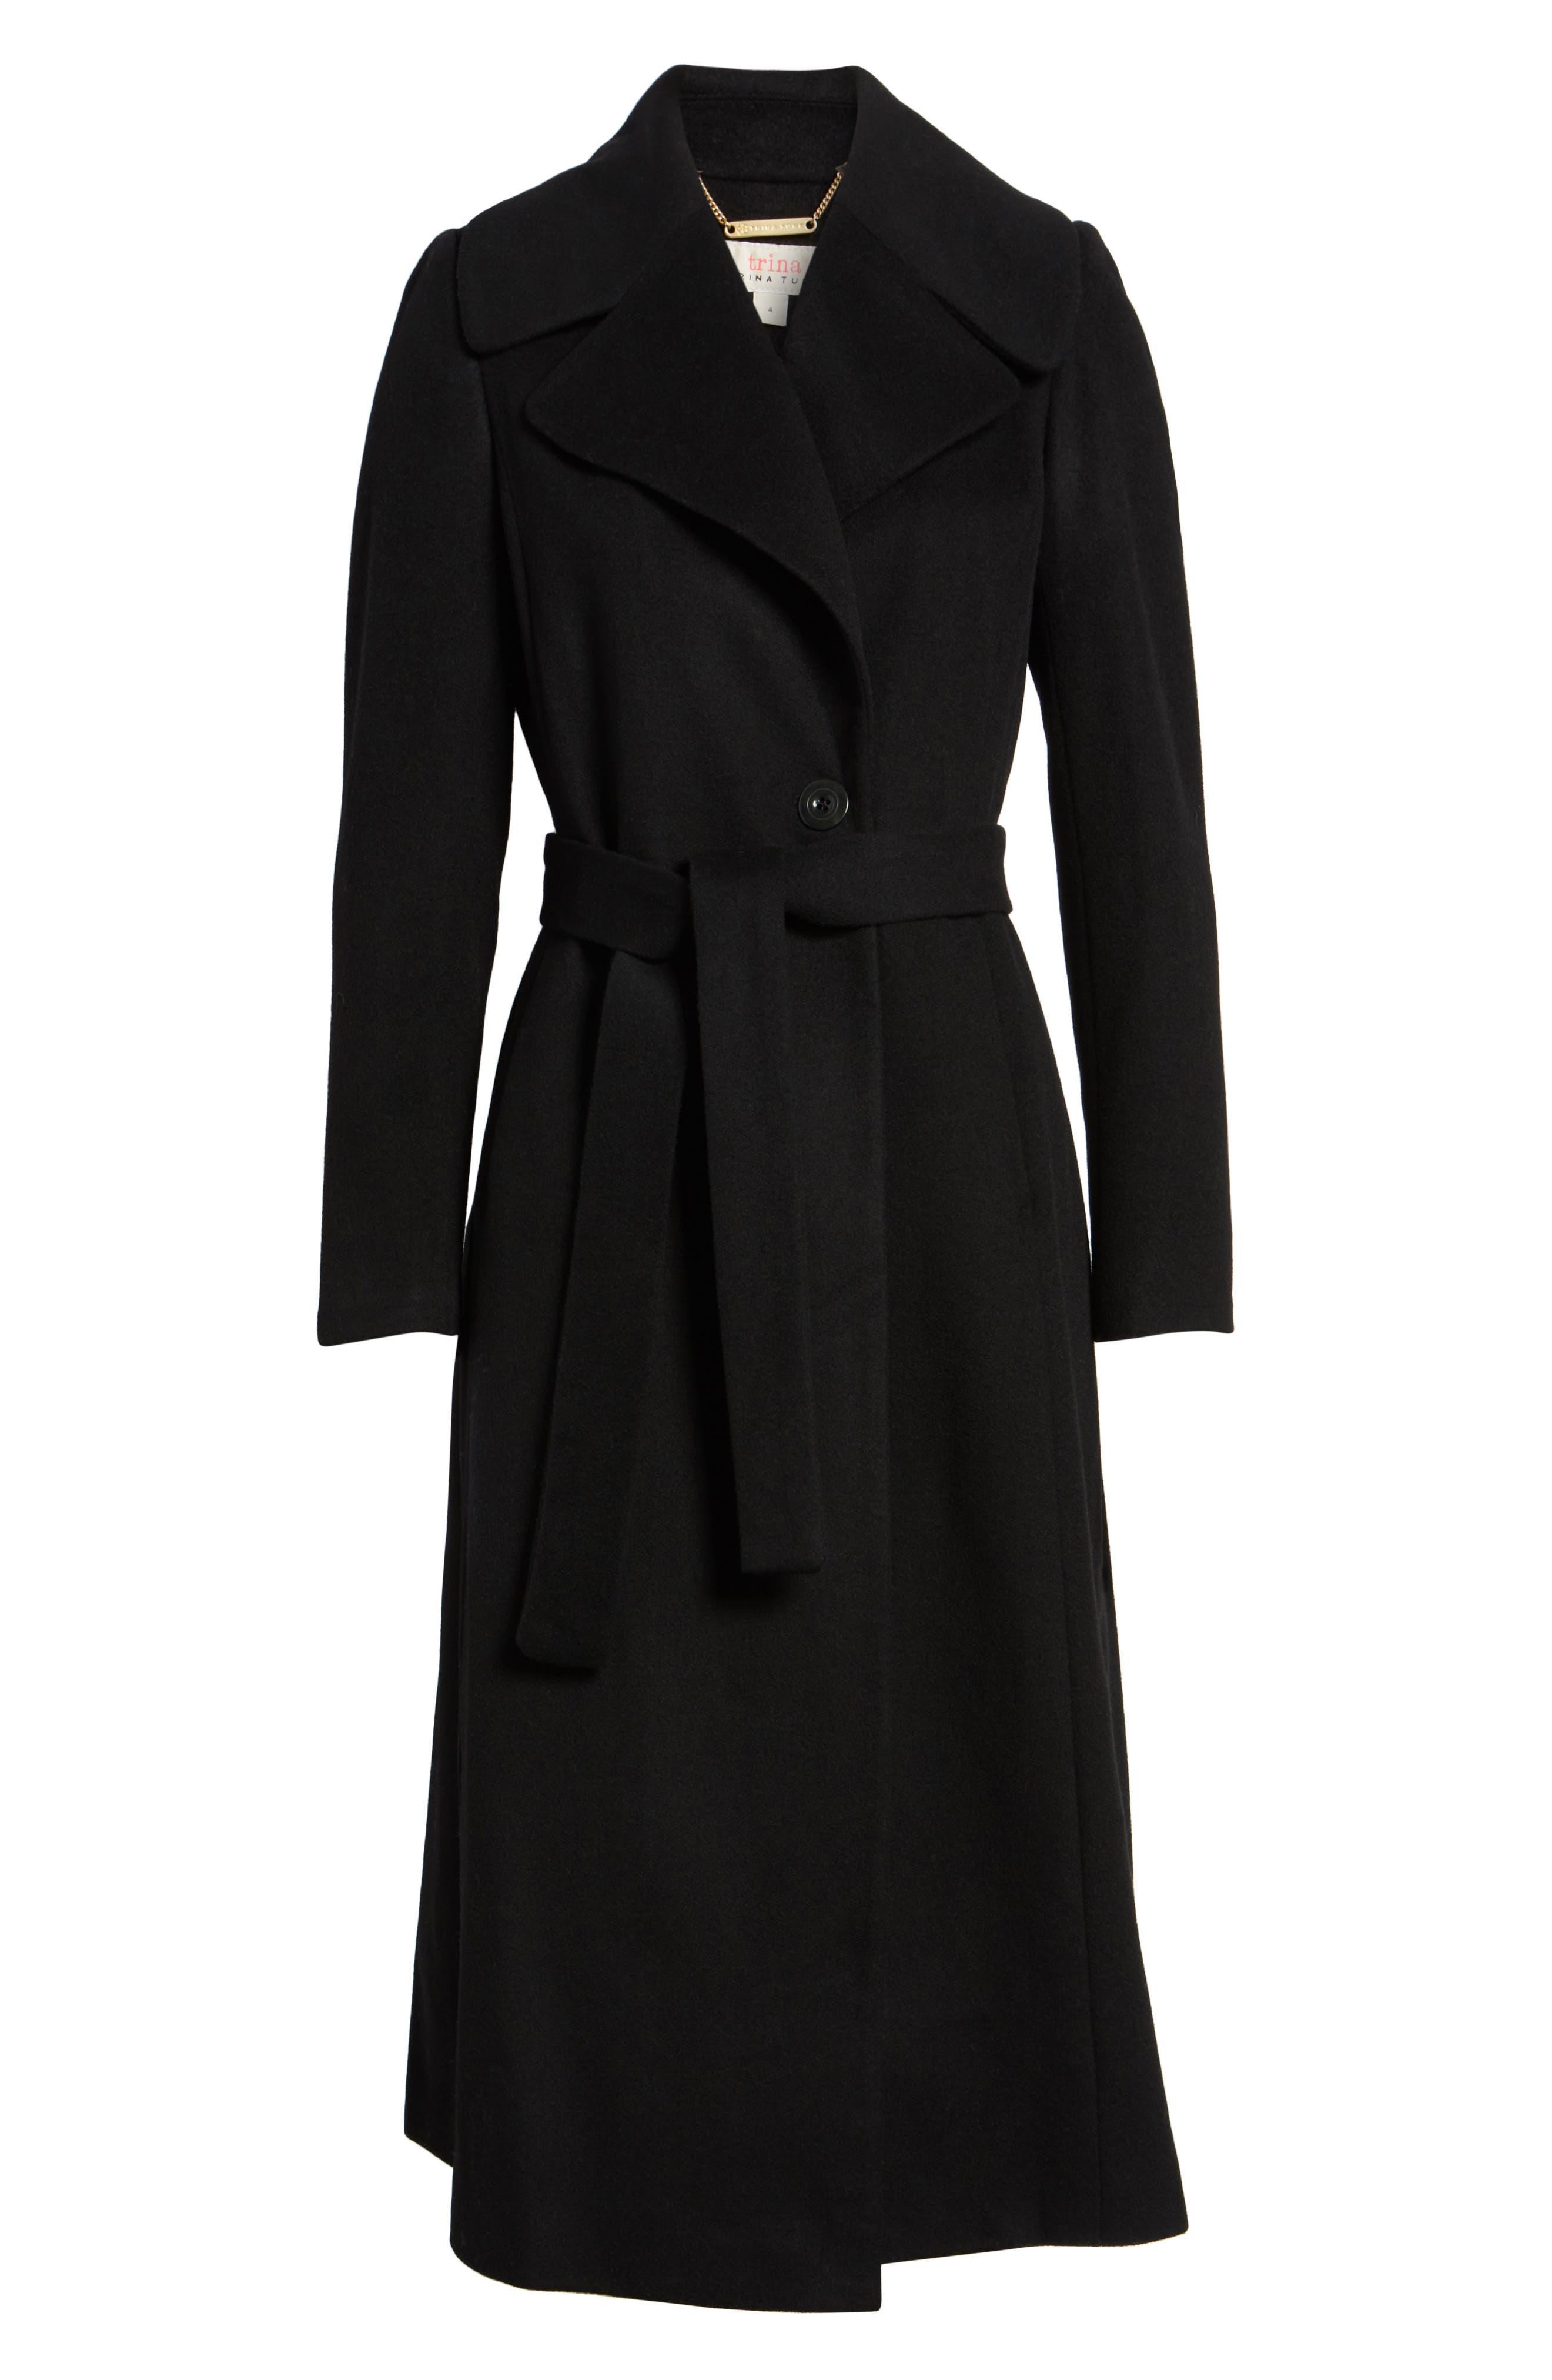 Trina Turk Kristen Wool Blend Peacoat,                         Main,                         color, Black